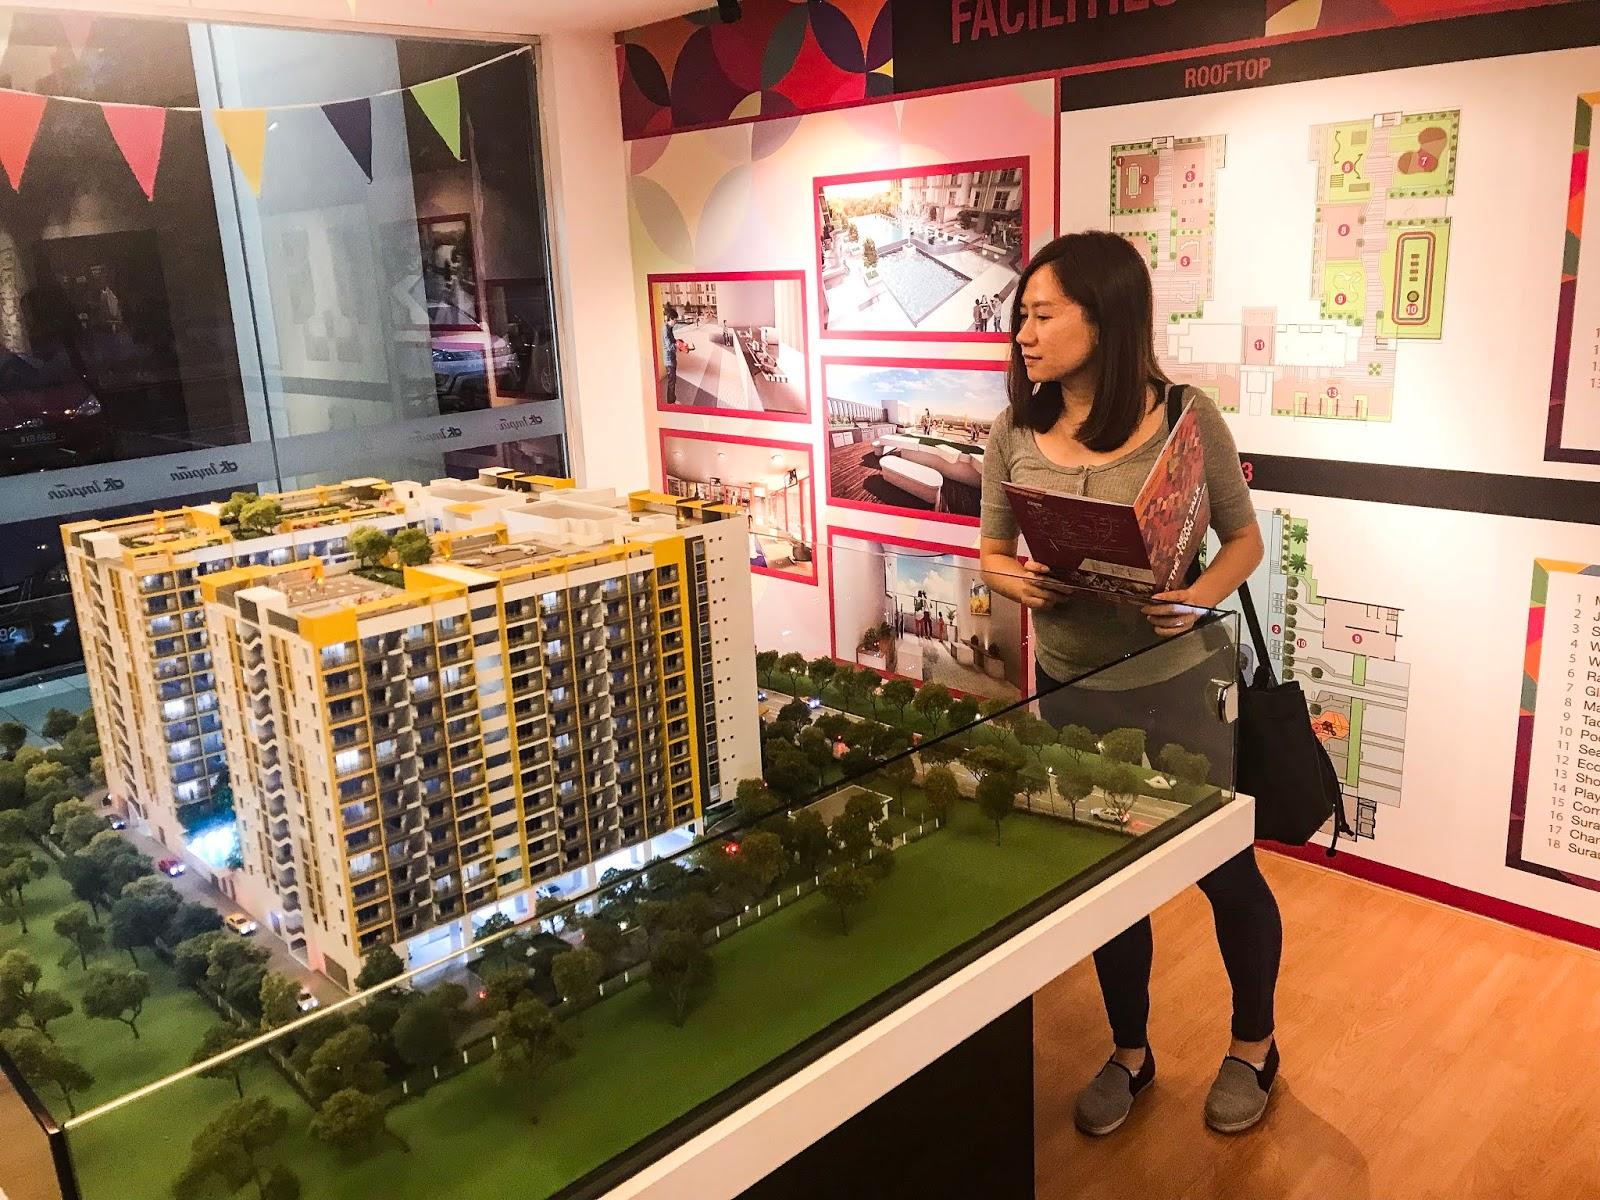 [Event] DK Impian Property @ Seksyen U5, Shah Alam